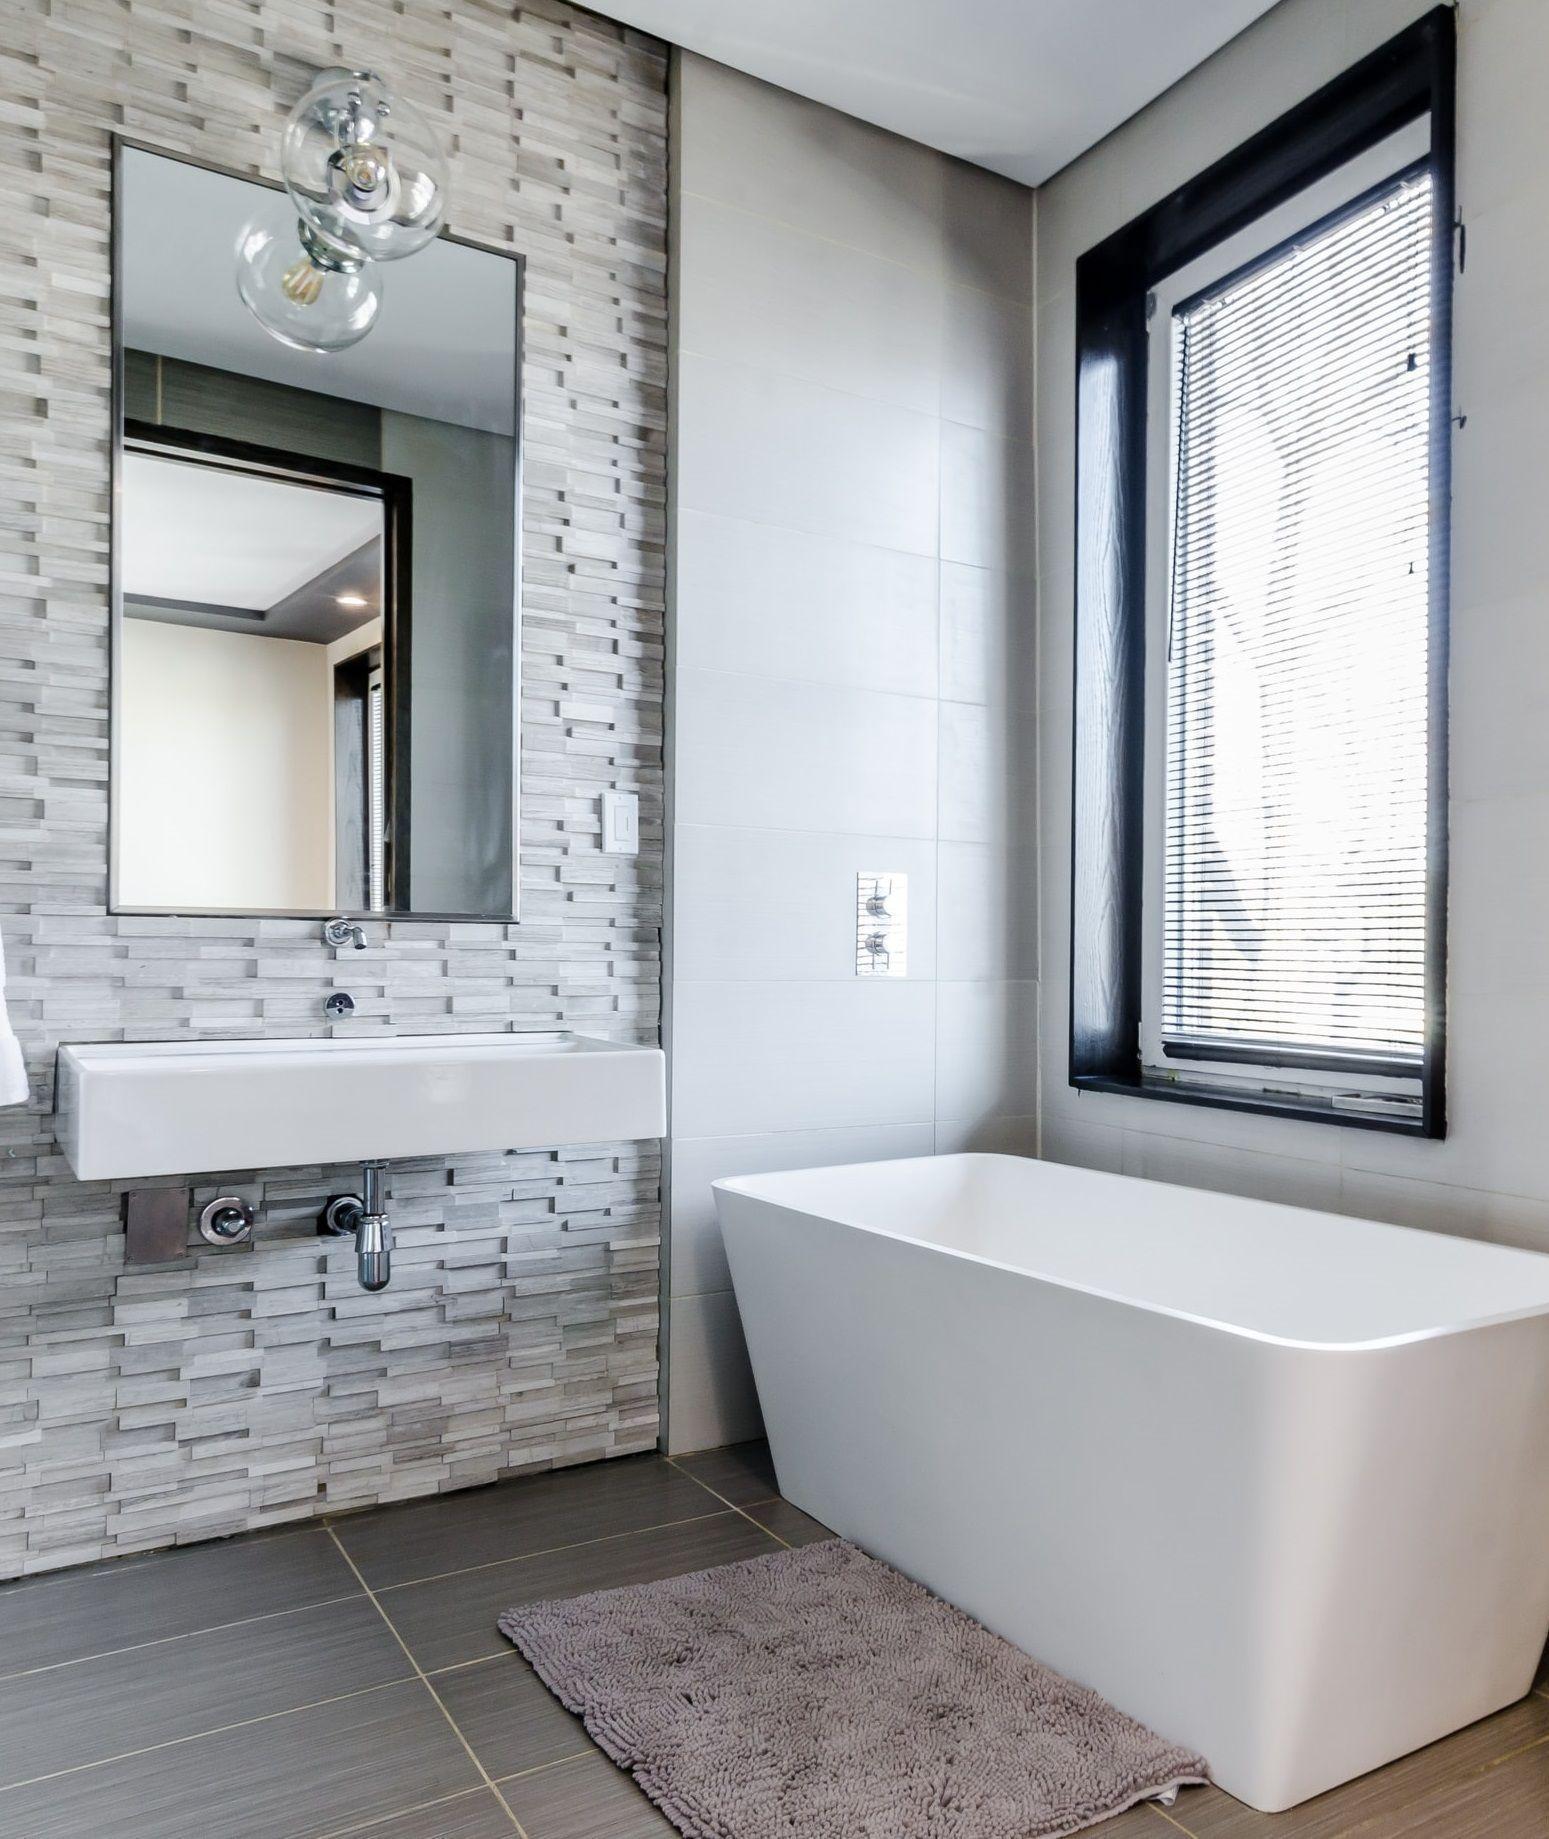 bathroom decor and tiles perth #bathroom decor online #bathroom